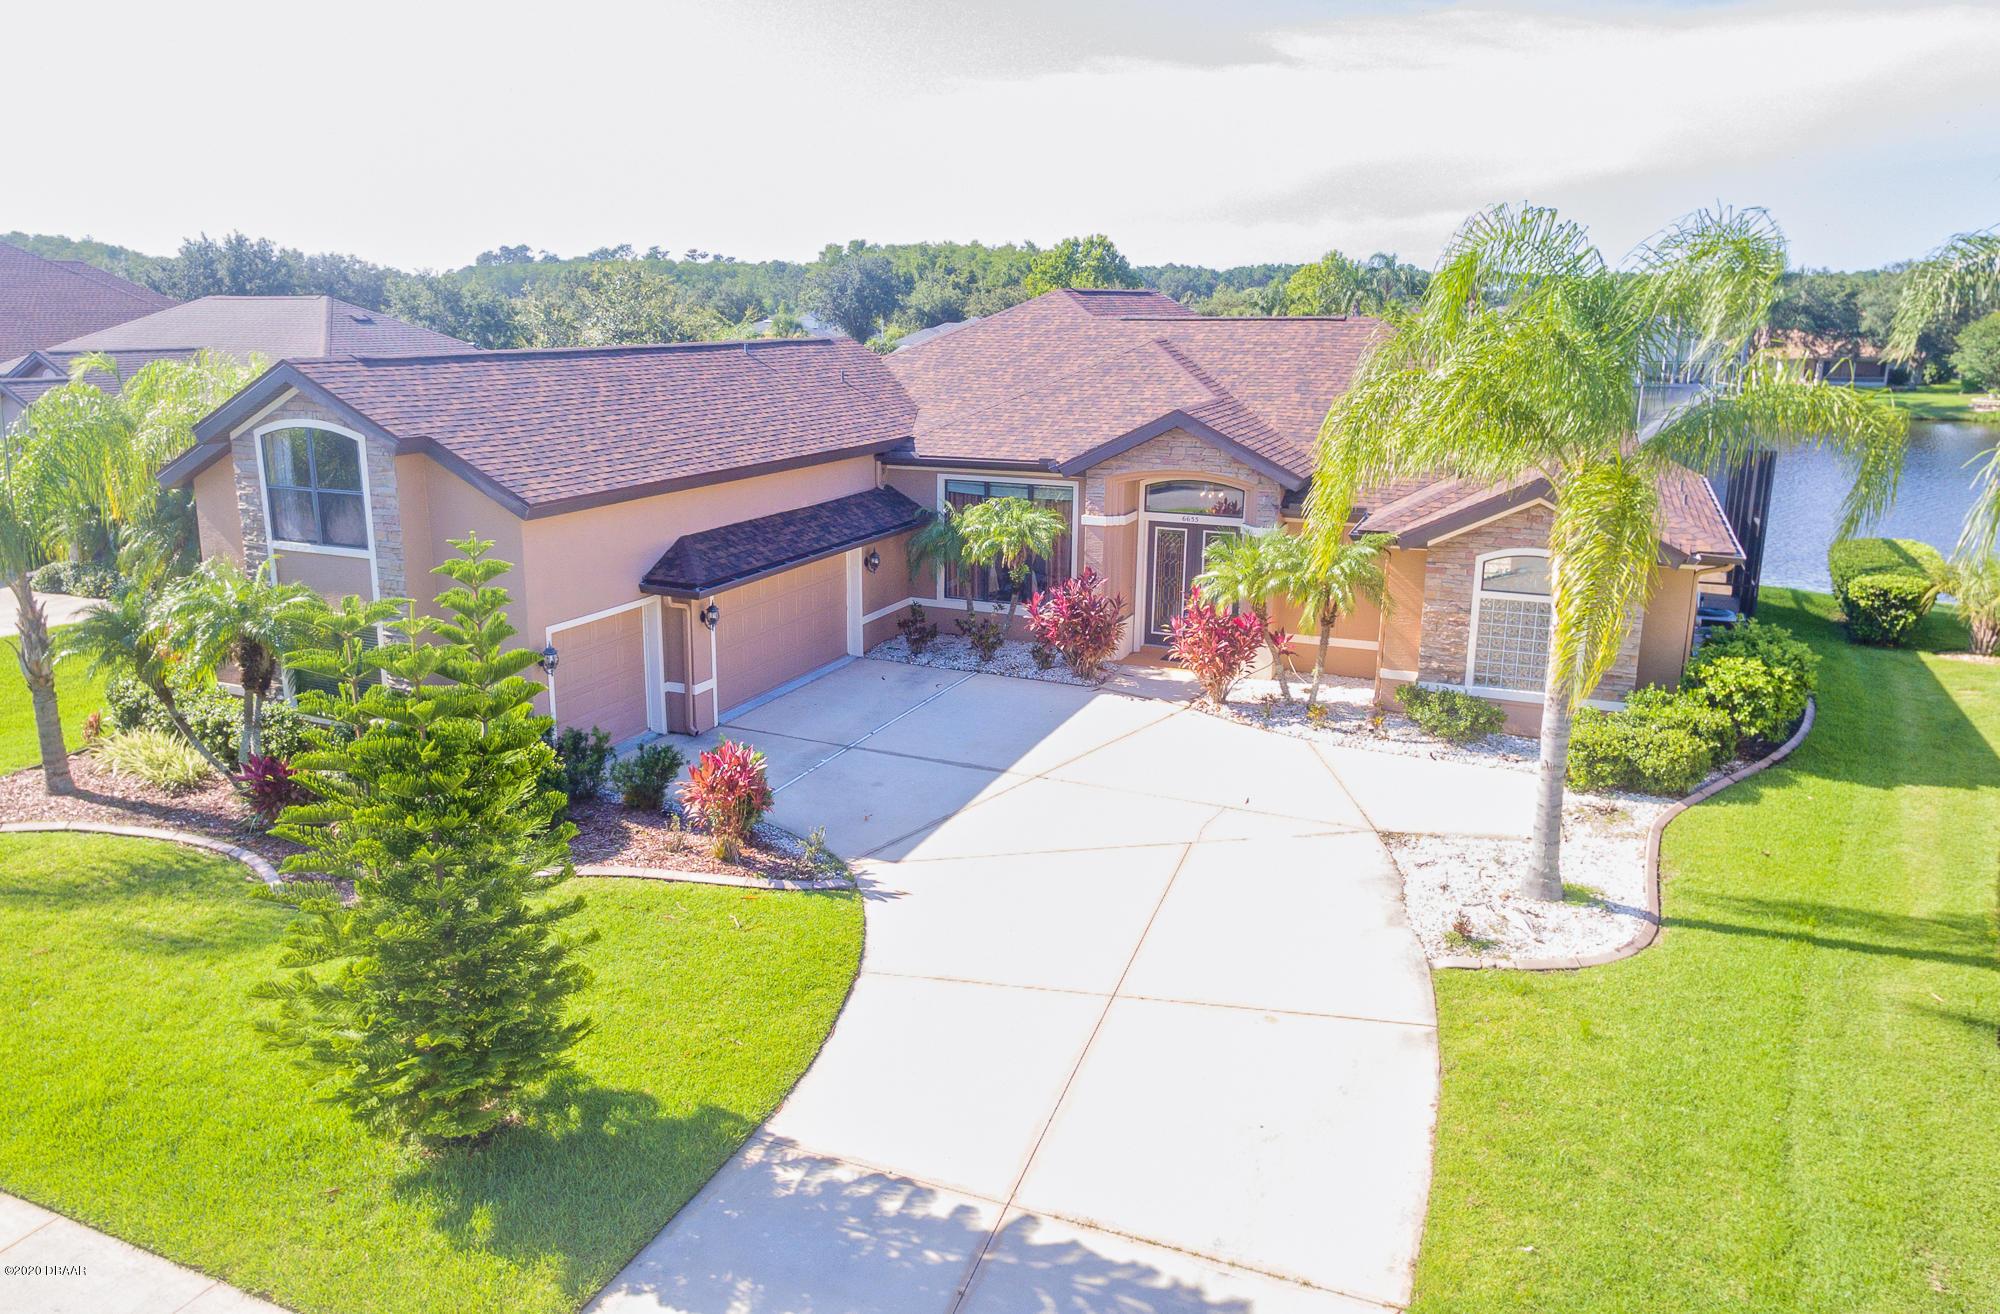 Photo of 6655 Merryvale Lane, Port Orange, FL 32128